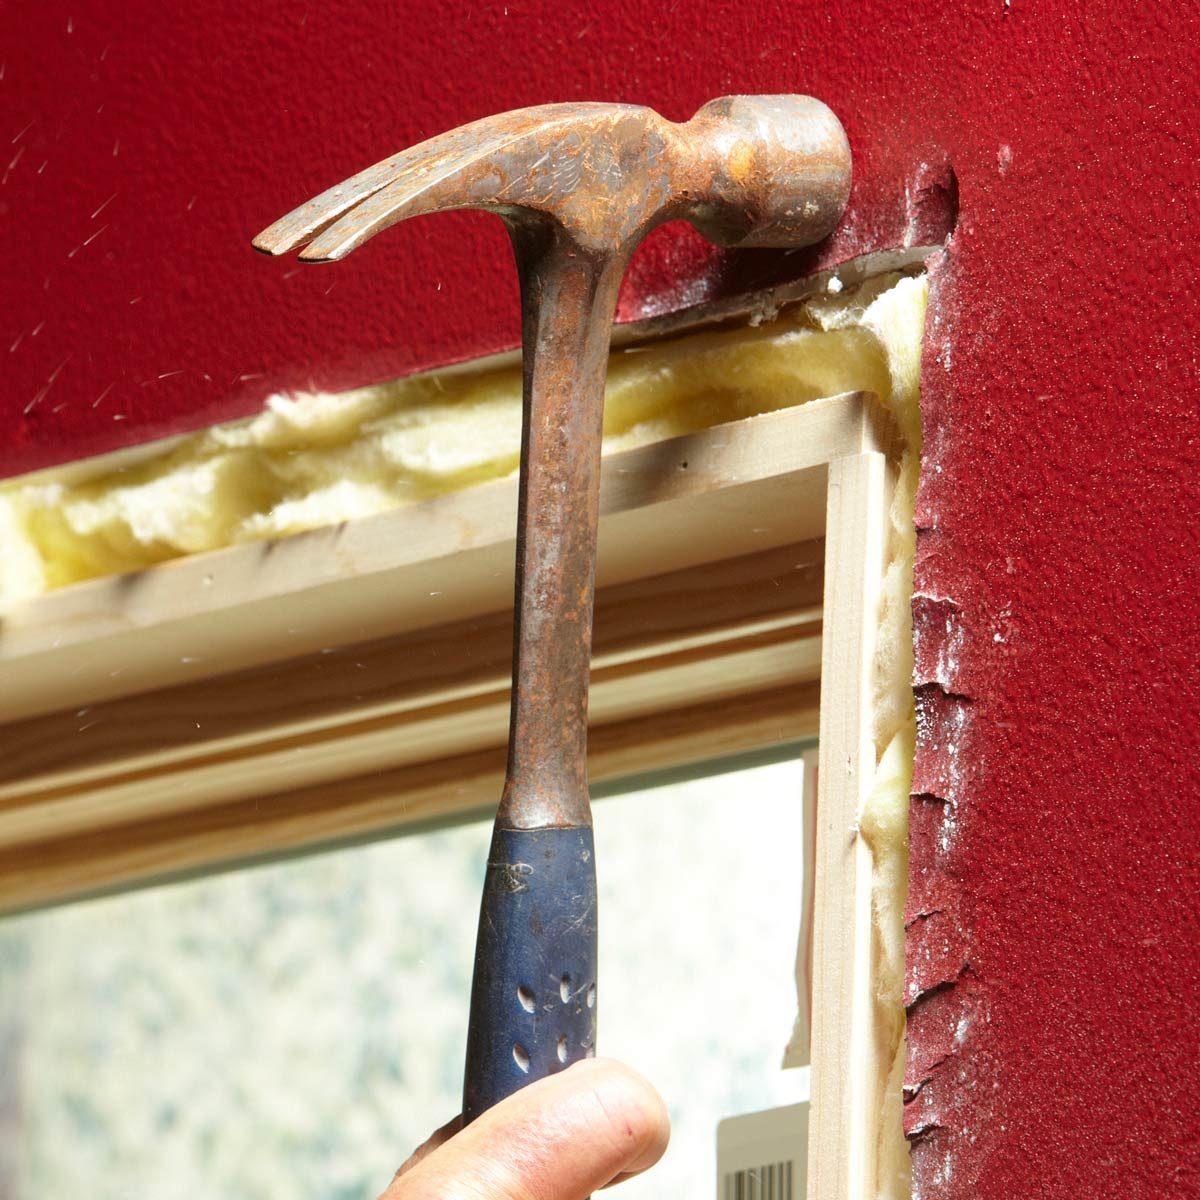 smash drywall around window trim